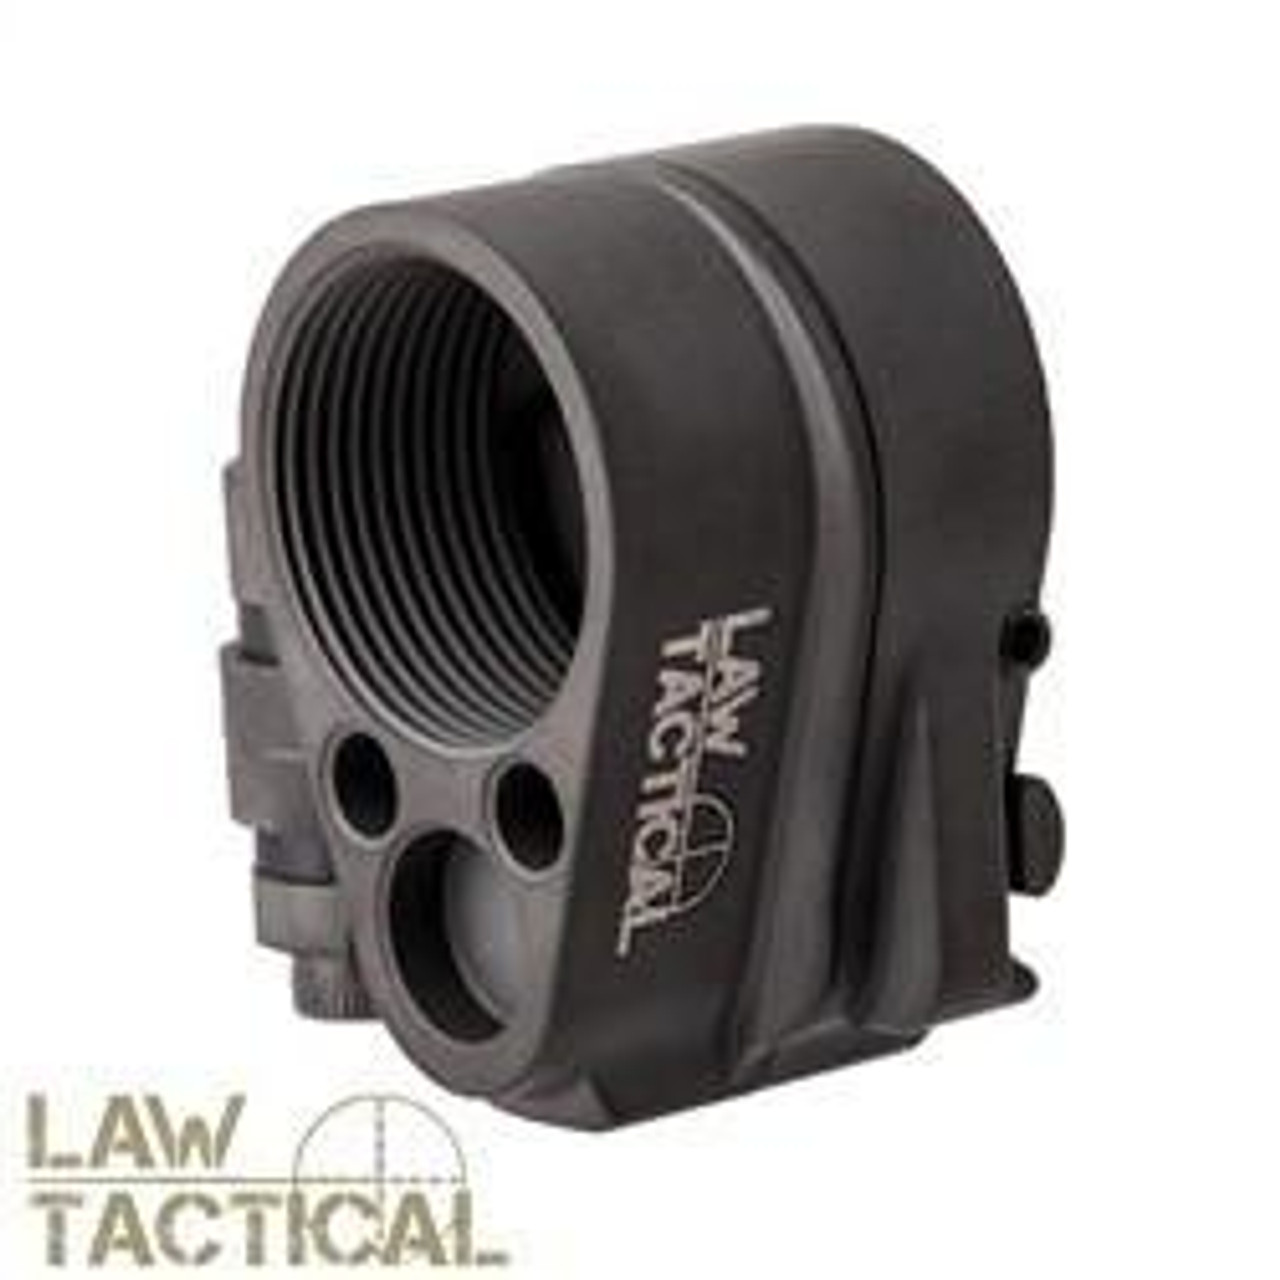 Law Tactical LLC AR-15/M16 Gen. 3 Folding Stock Adapter